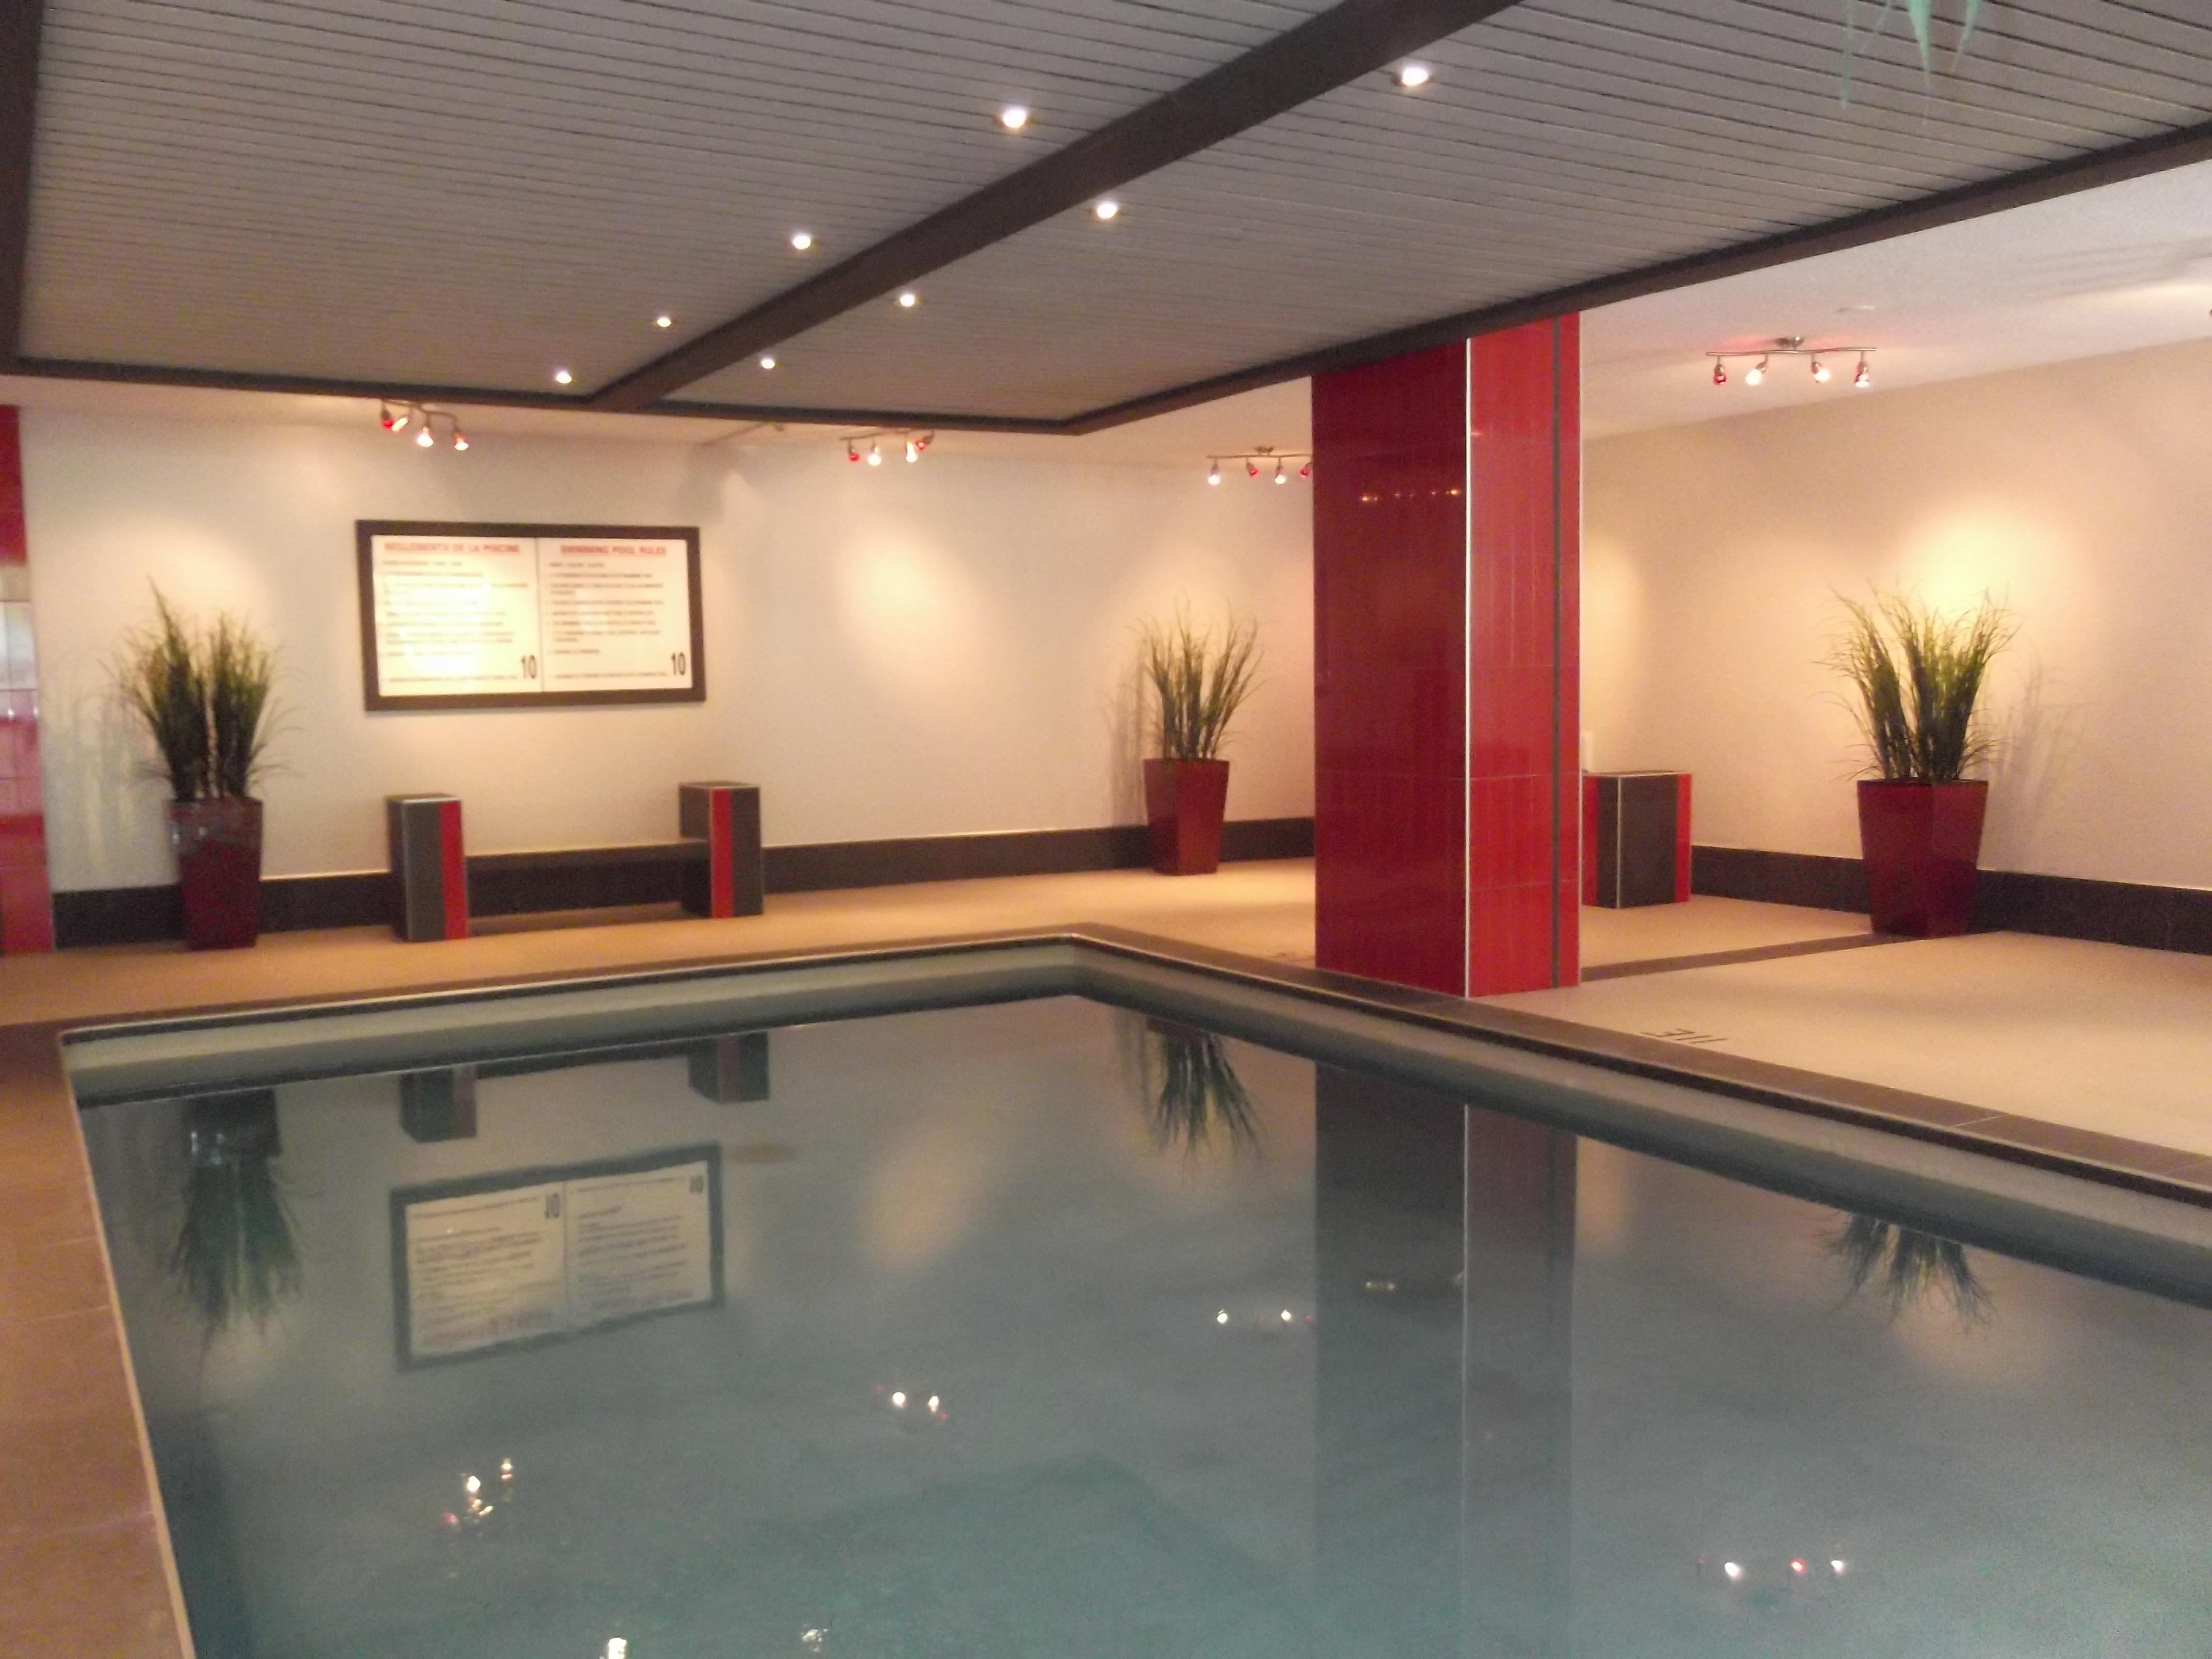 Studio / Bachelor Apartments for rent in Plateau Mont-Royal at Tour Lafontaine - Photo 02 - RentersPages – L23203